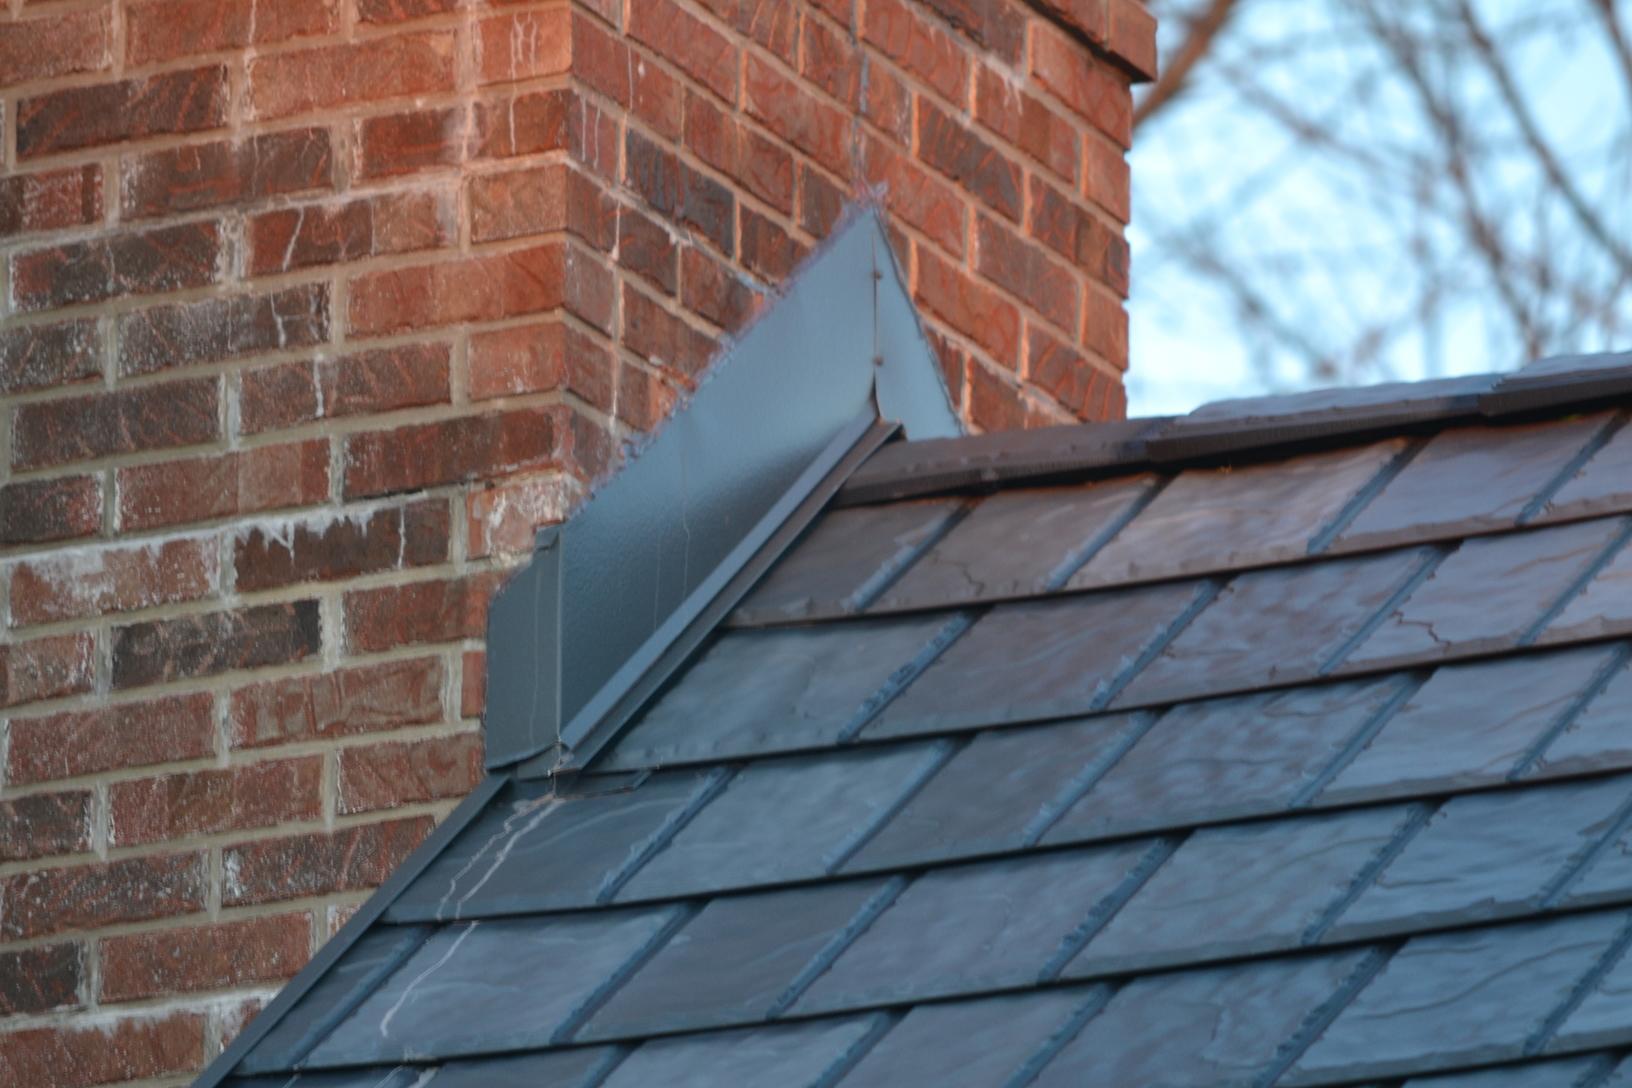 Chimney Flashing on Steel Slate Roof